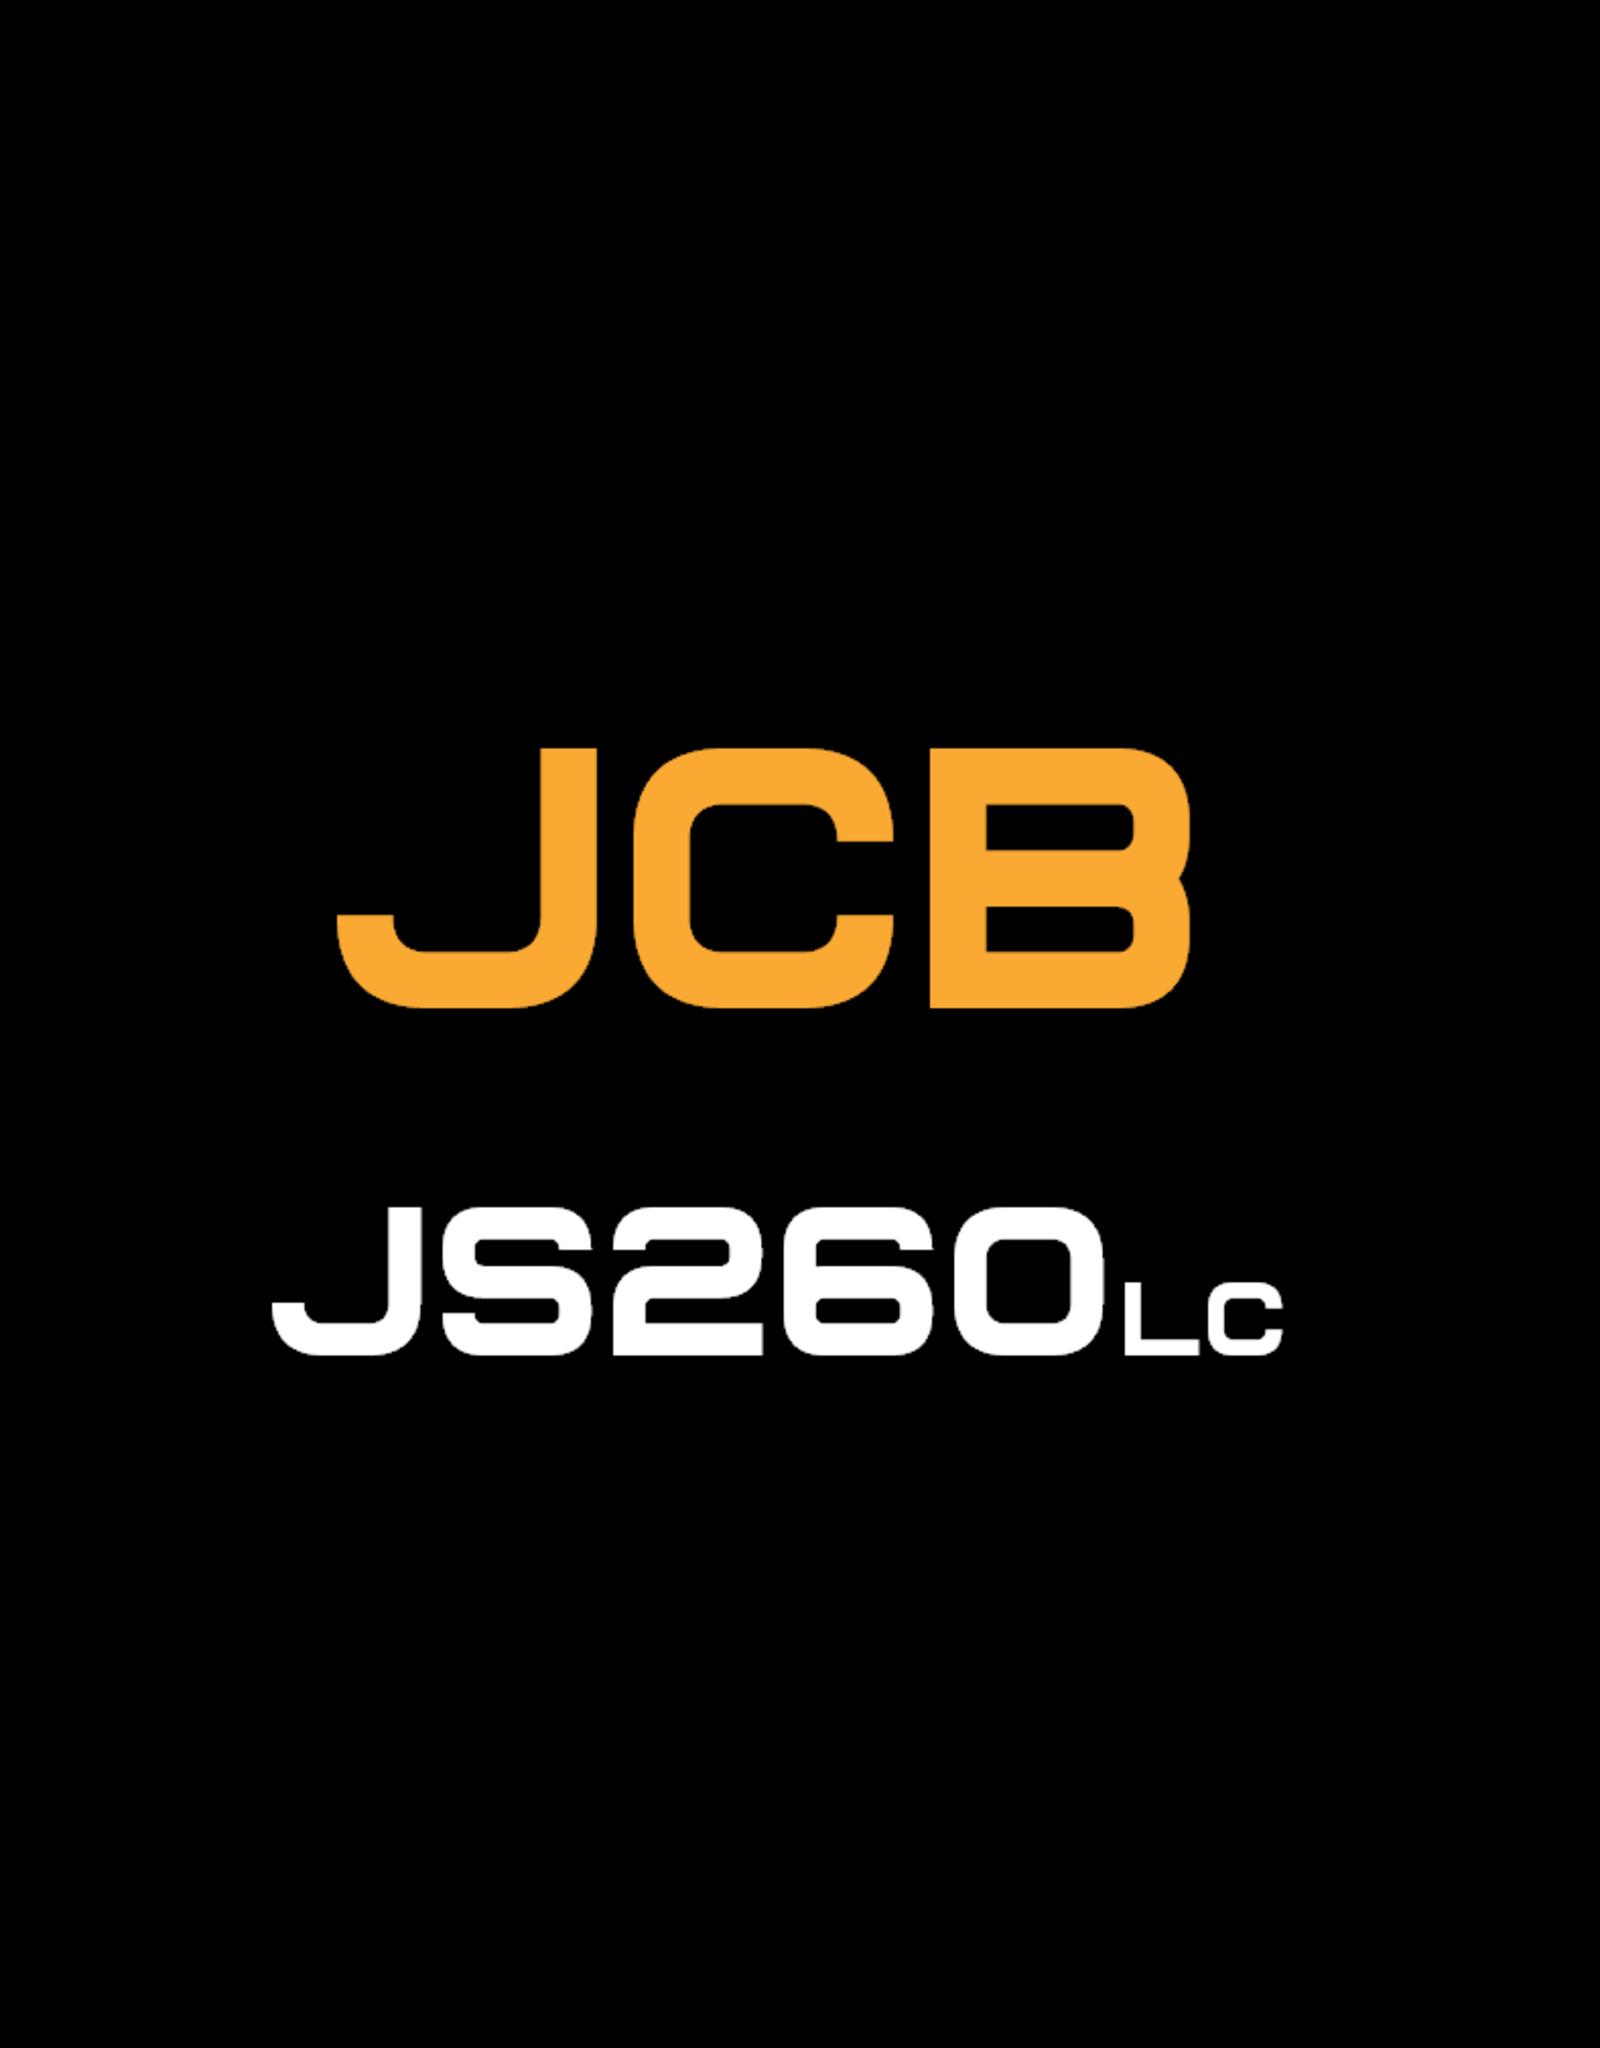 Echle Hartstahl GmbH FOPS for JCB JS260LC